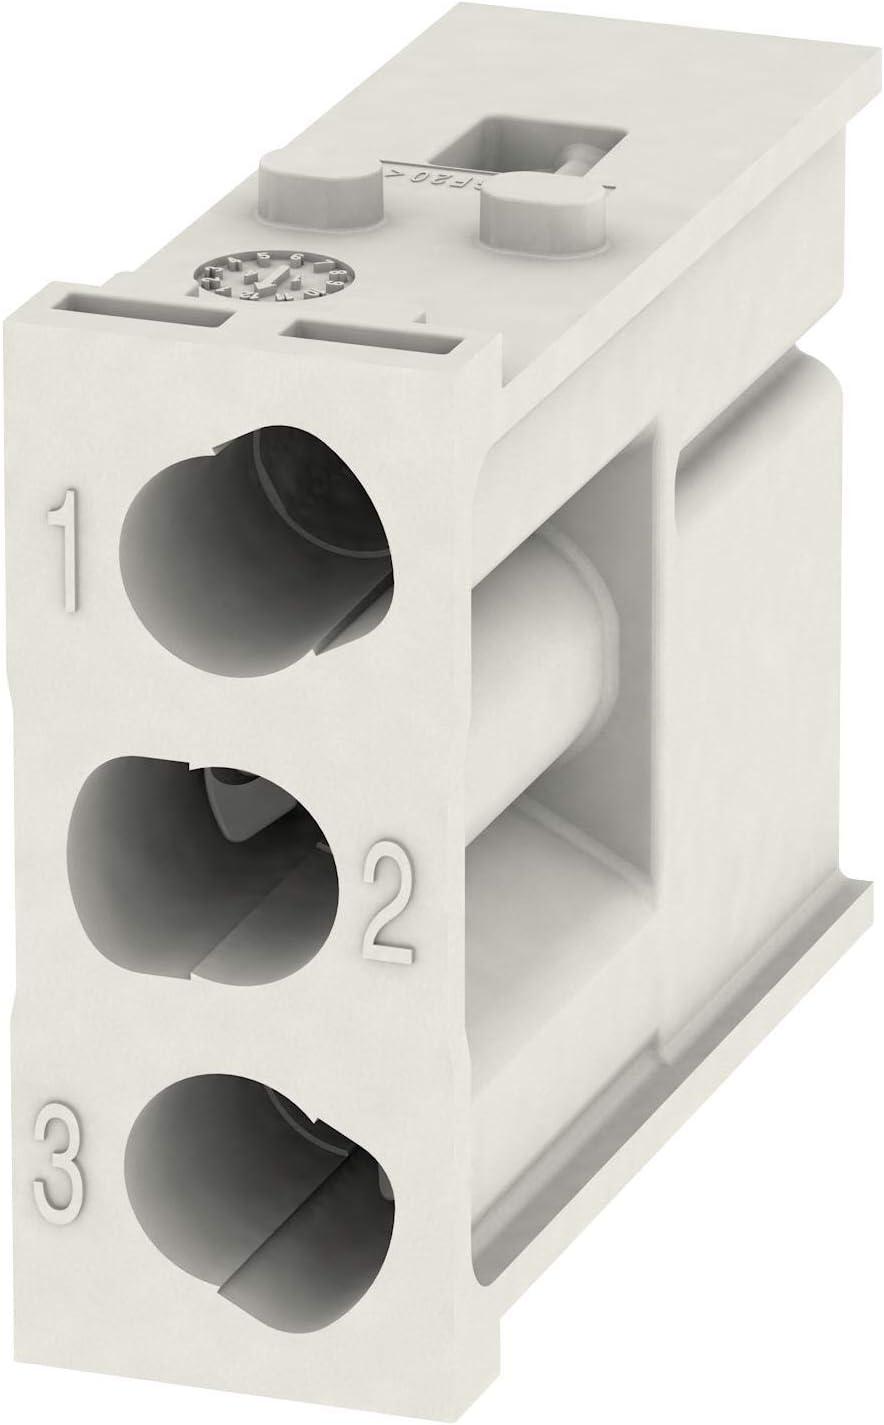 HDC MHX 3 MC PLUG HEAVY DUTY MODULE Pack of 5 16-8AWG, 3POS